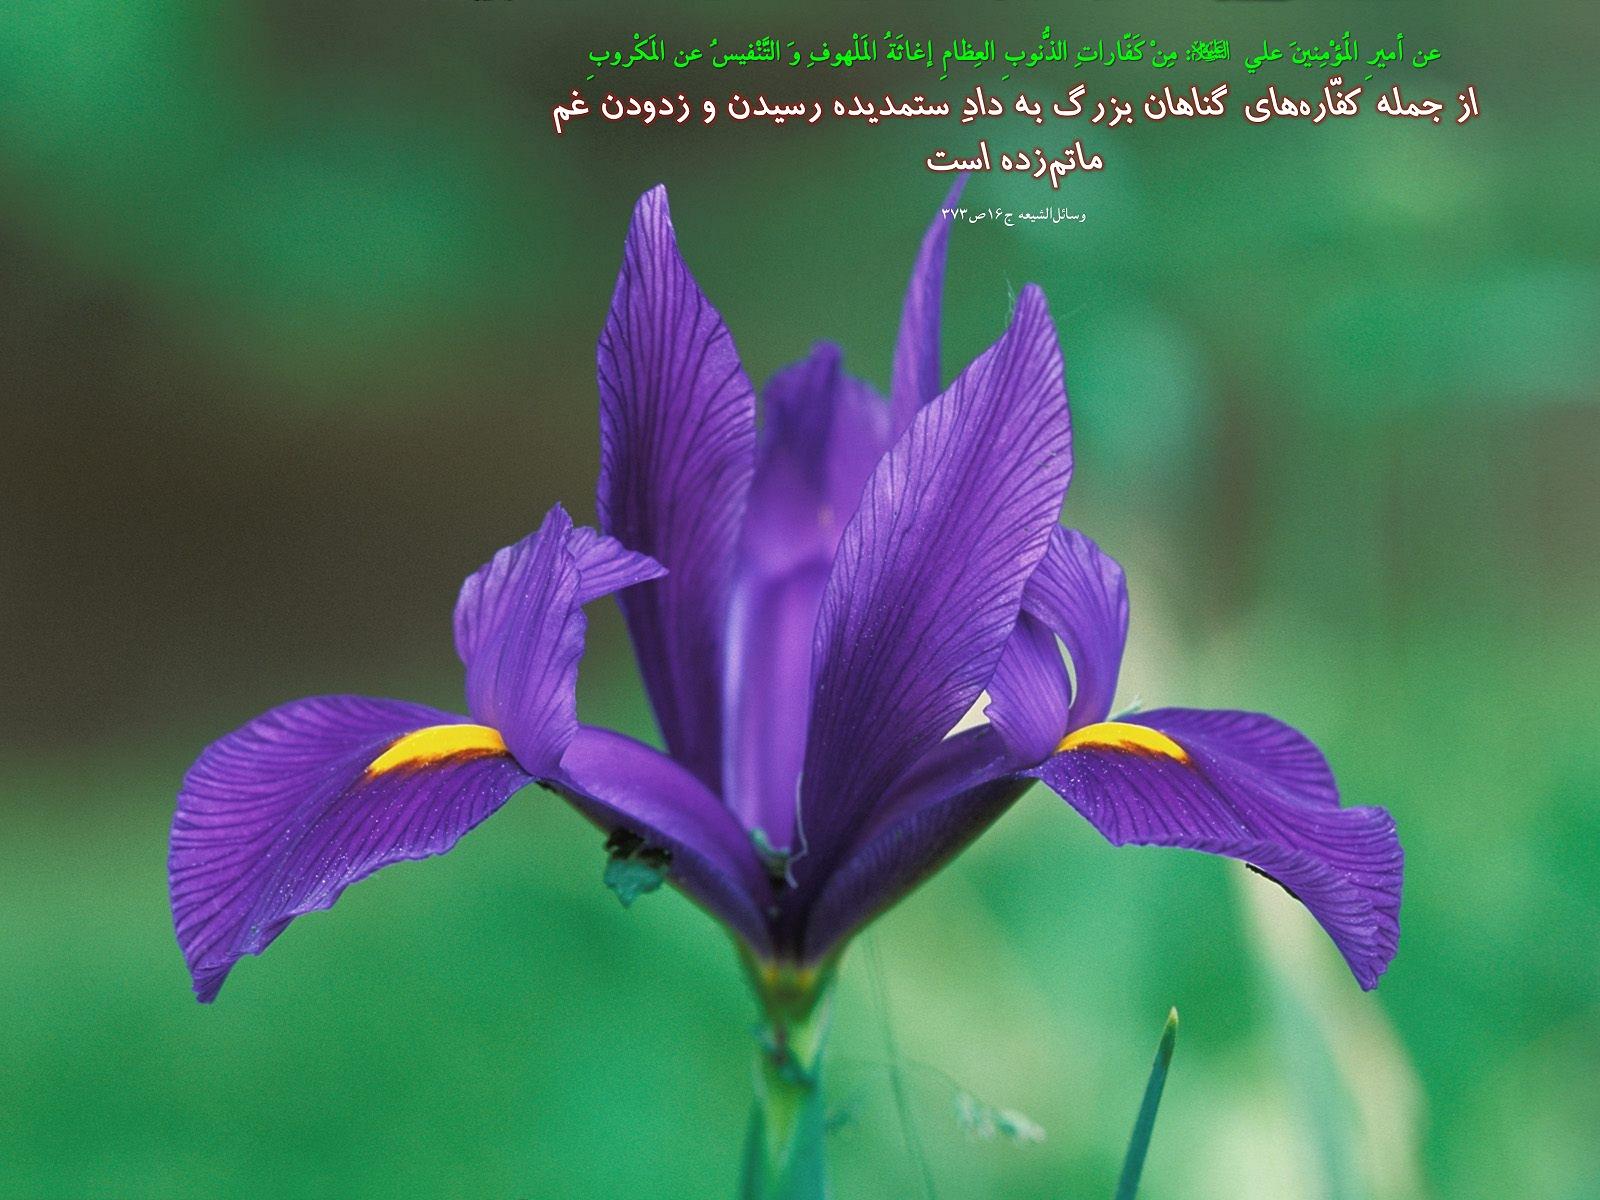 http://s2.picofile.com/file/7822438274/810_Hadis_259.jpg